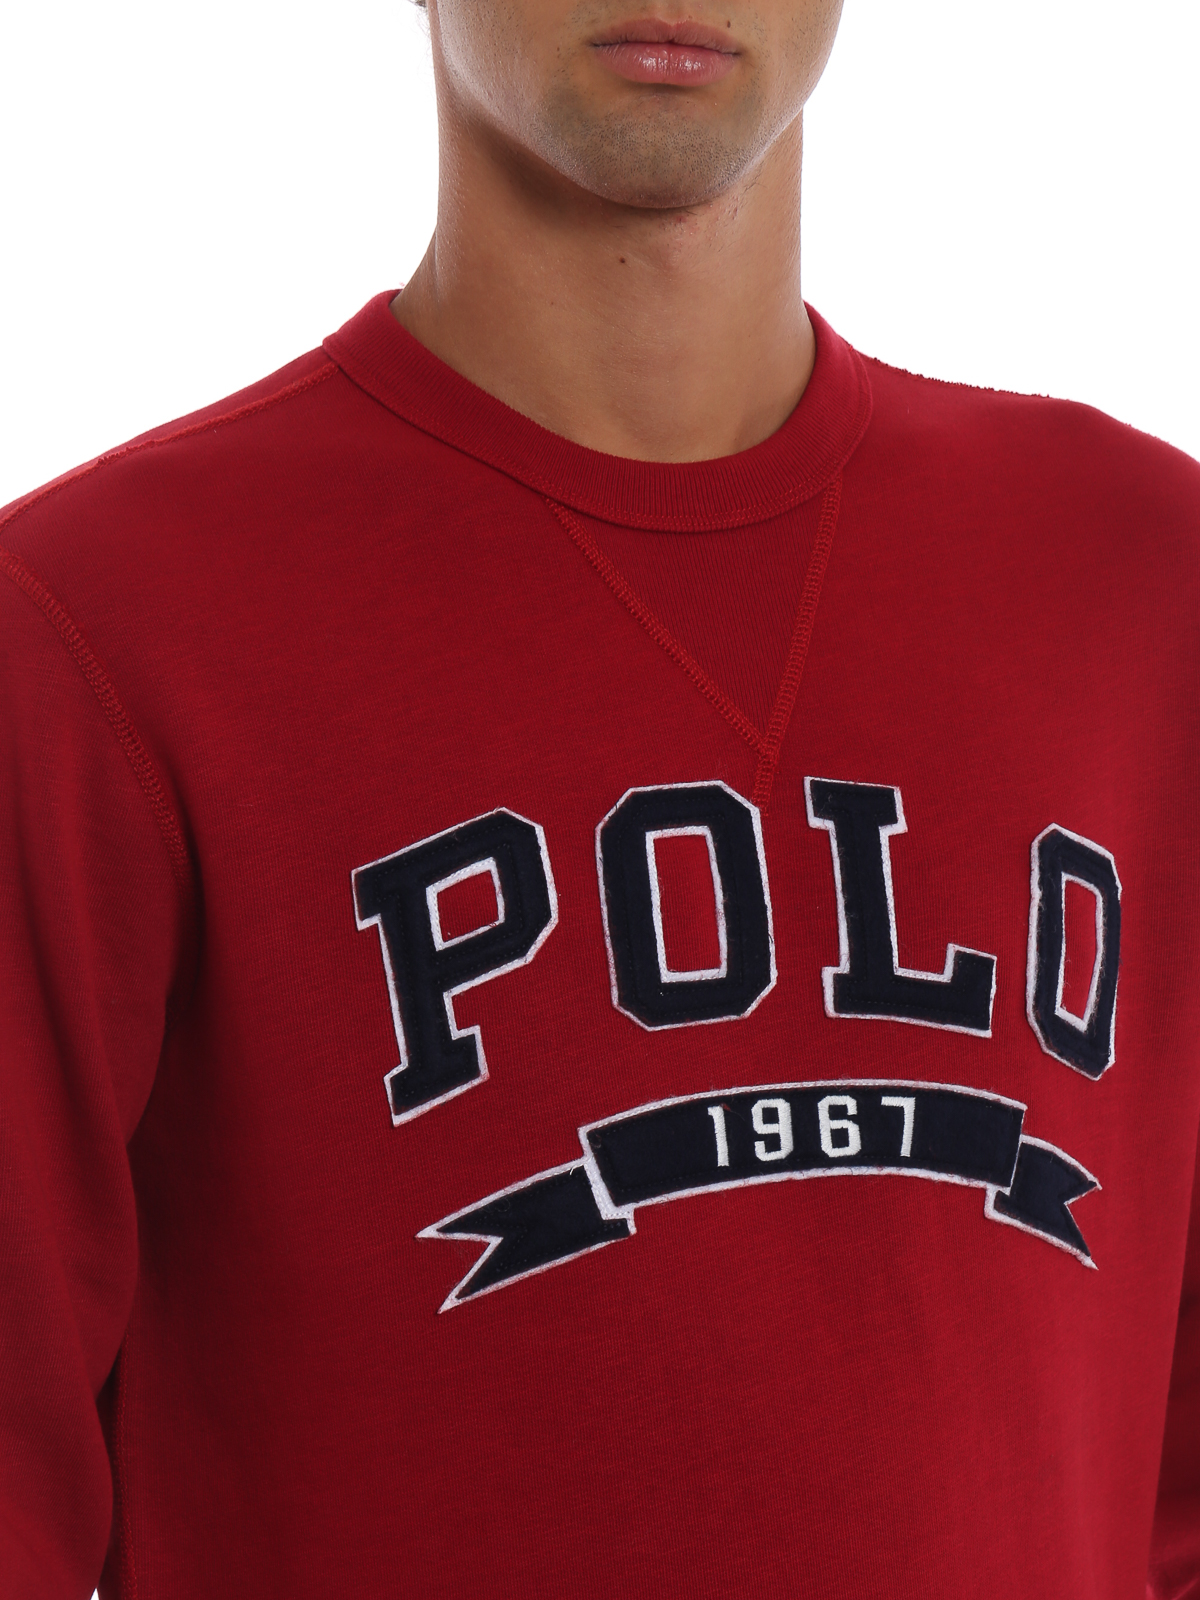 the latest 33bc4 e9880 Polo Ralph Lauren - Felpa rossa Polo 1967 - Felpe e maglie ...